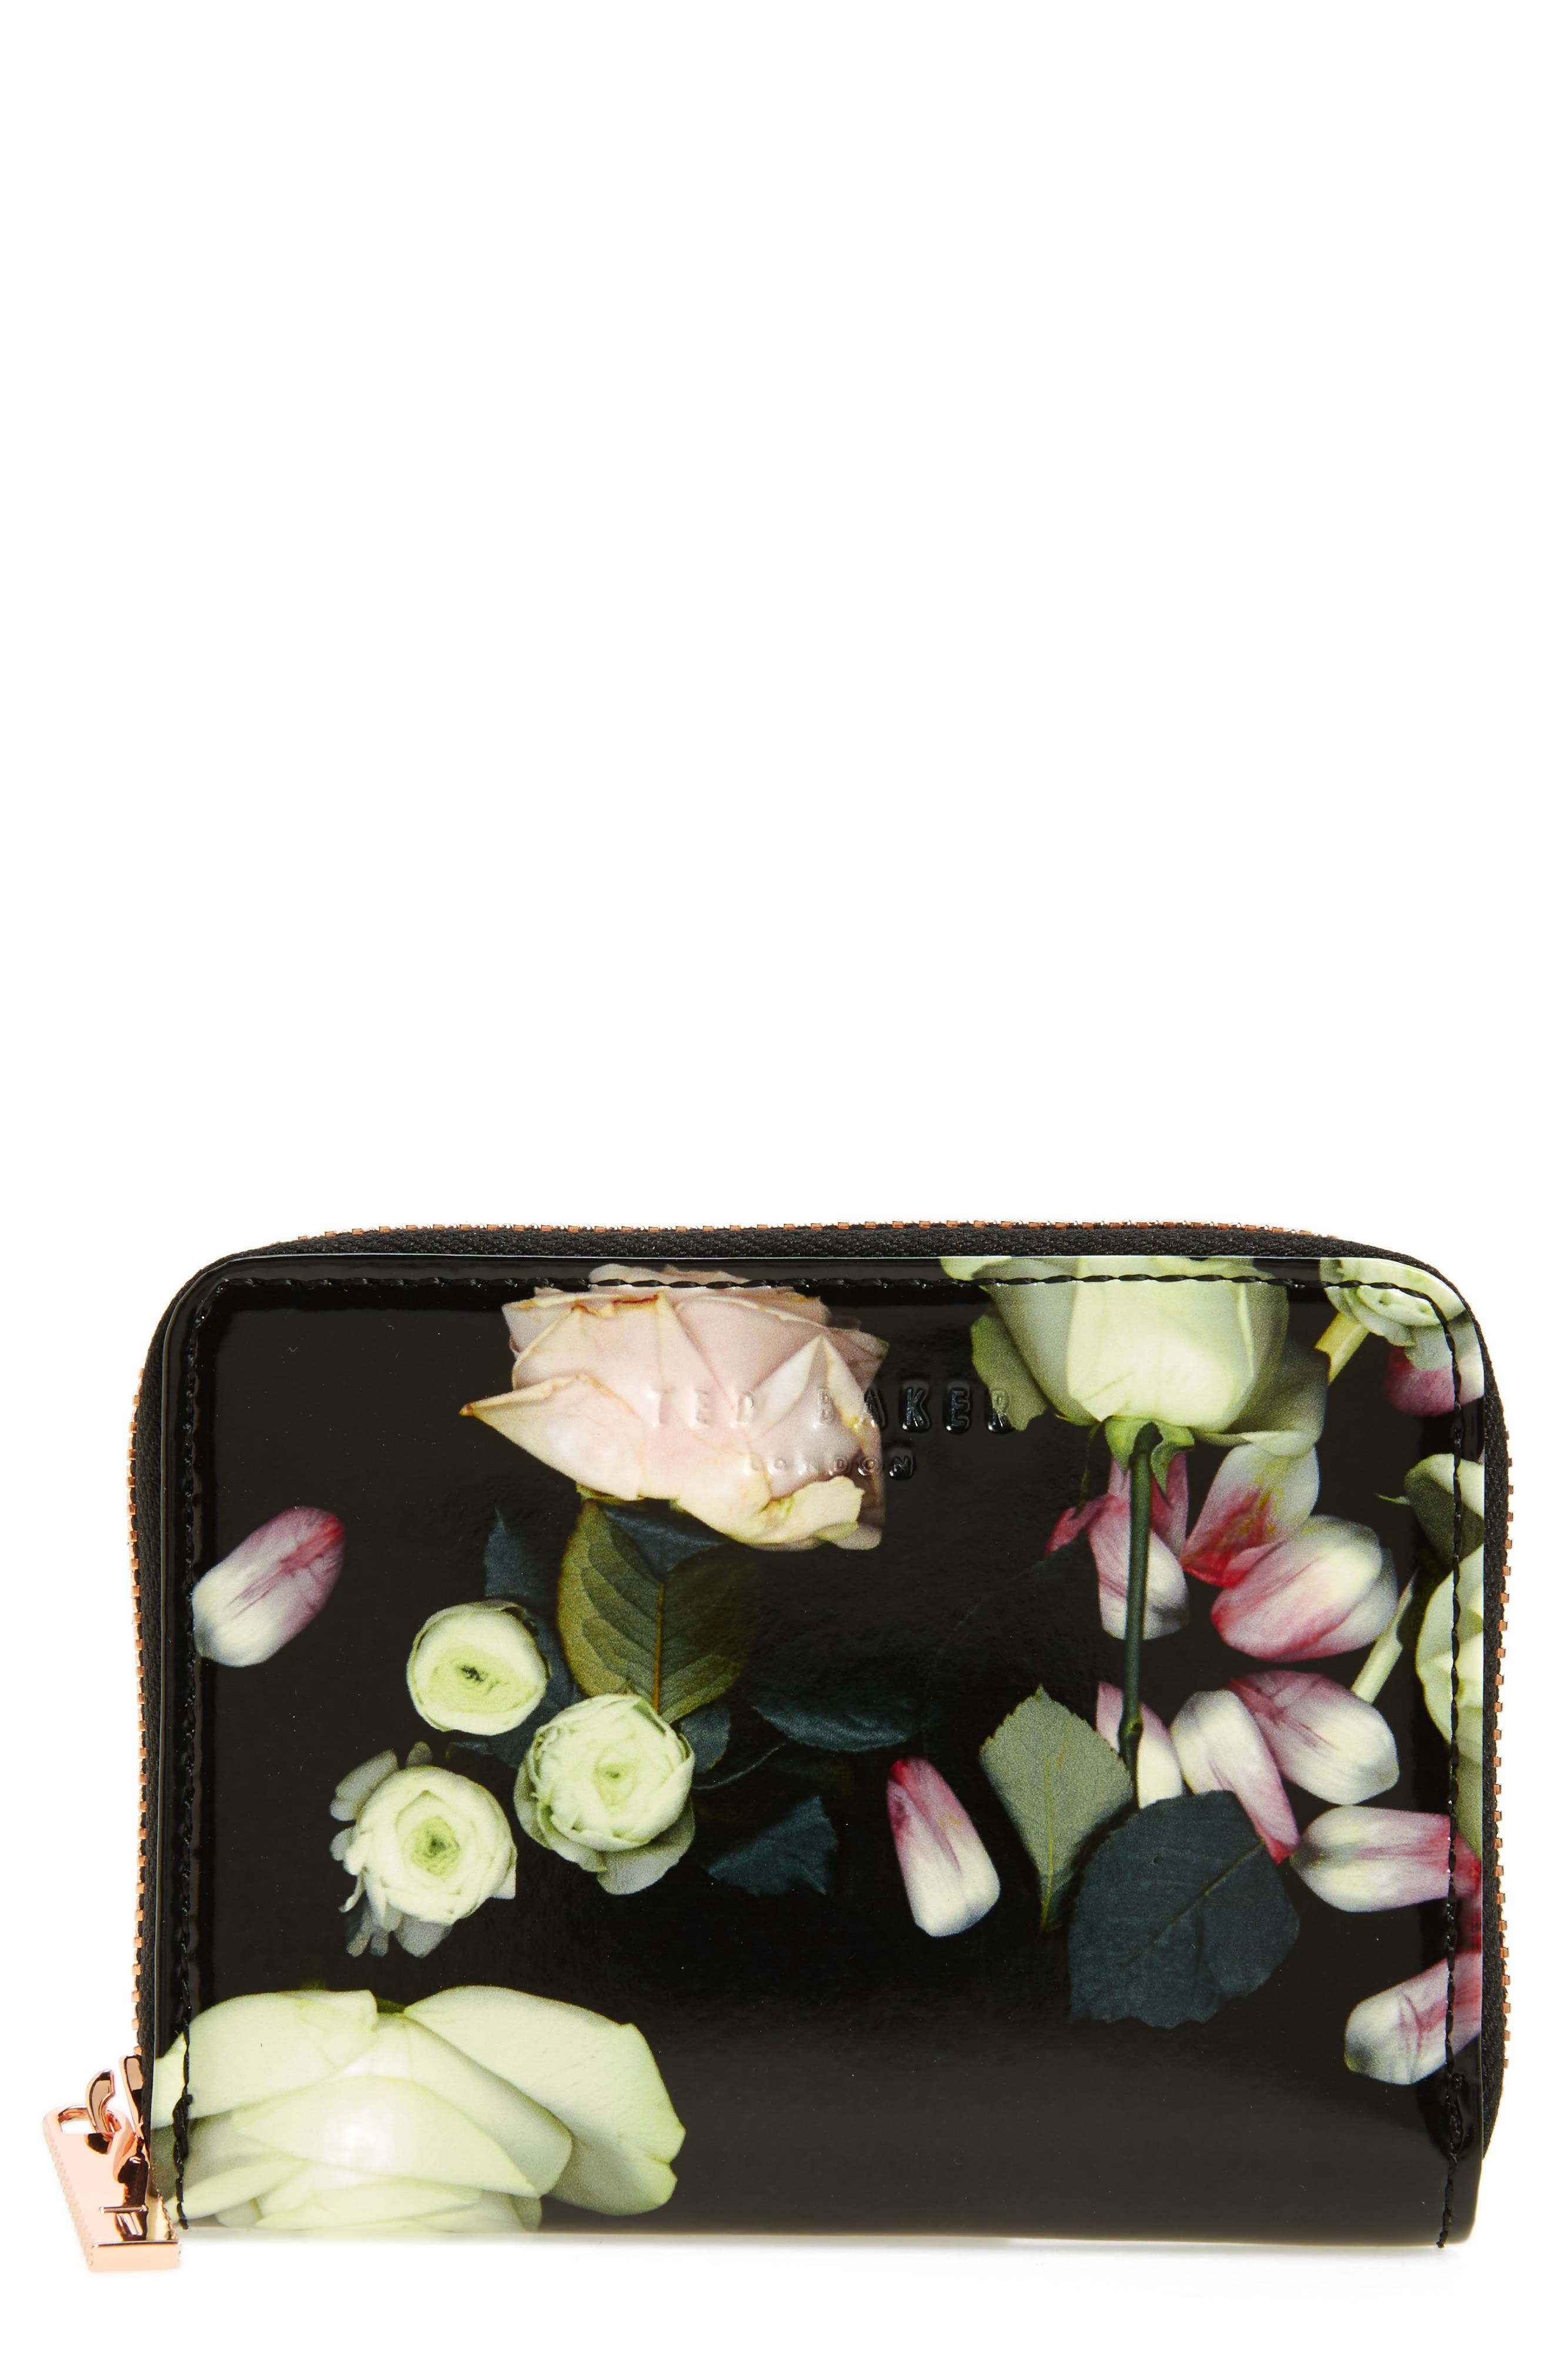 Ted Baker London Mayycie Kensington Floral Leather Mini Purse